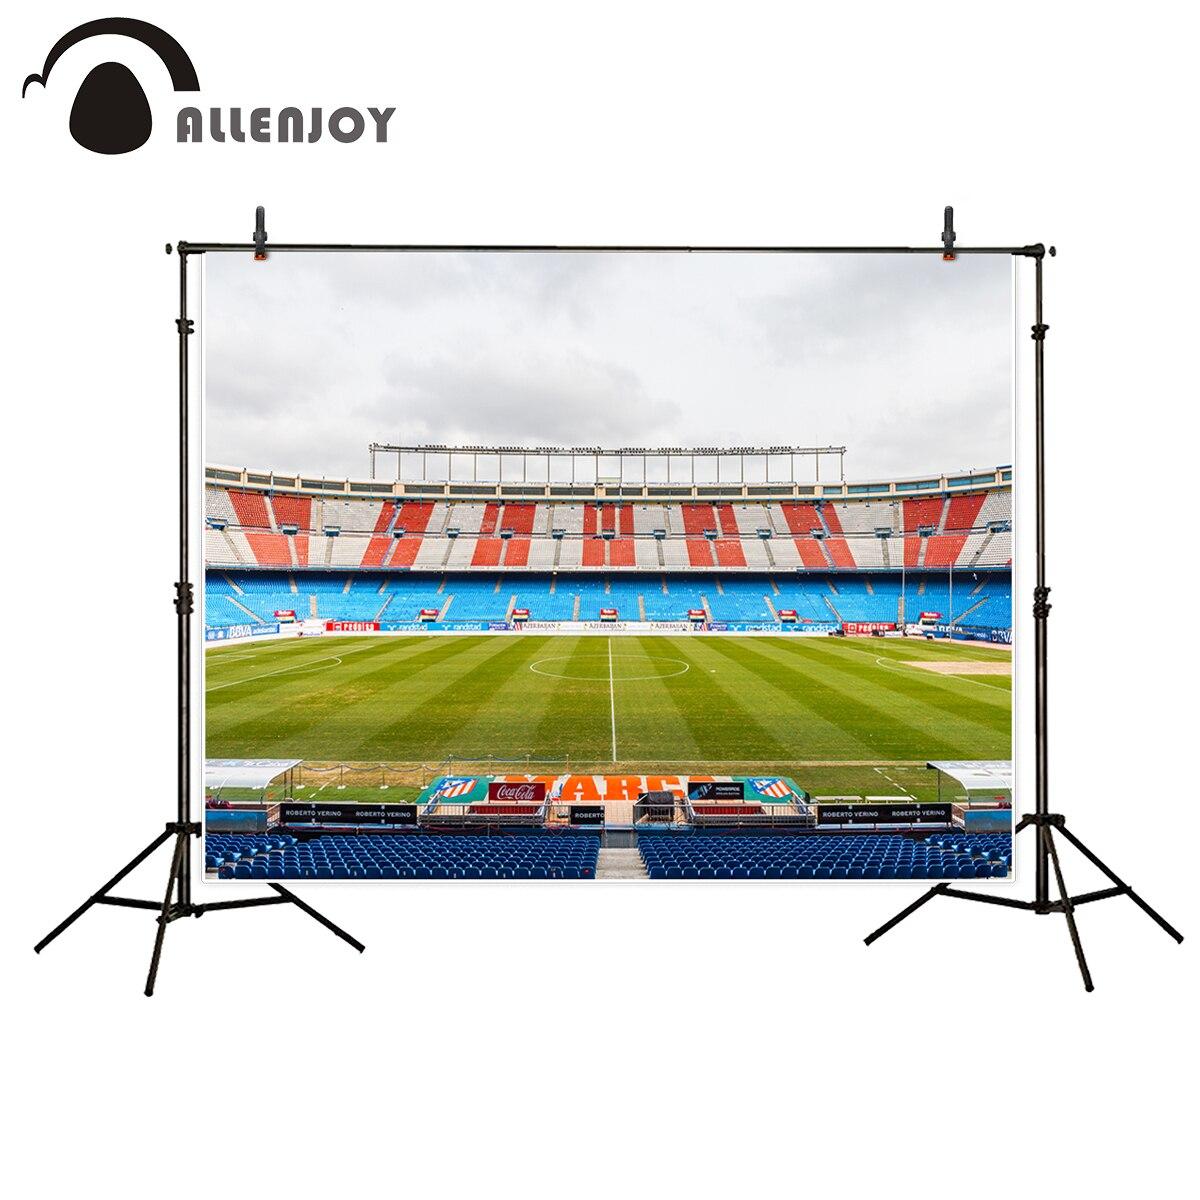 Allenjoy photocall football field custom Birthday Wedding Party backdrop for weddings fond for studio photography